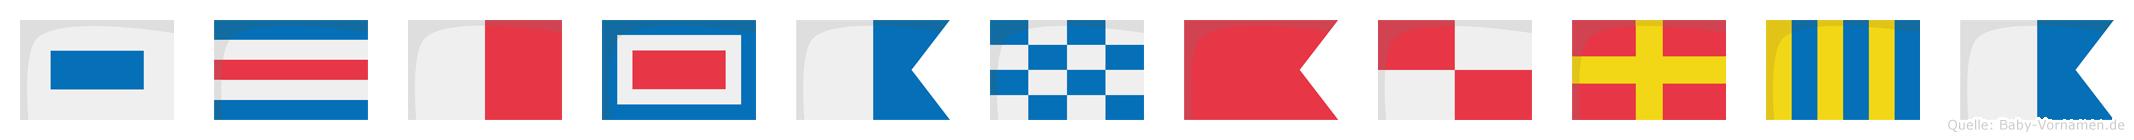 Schwanburga im Flaggenalphabet